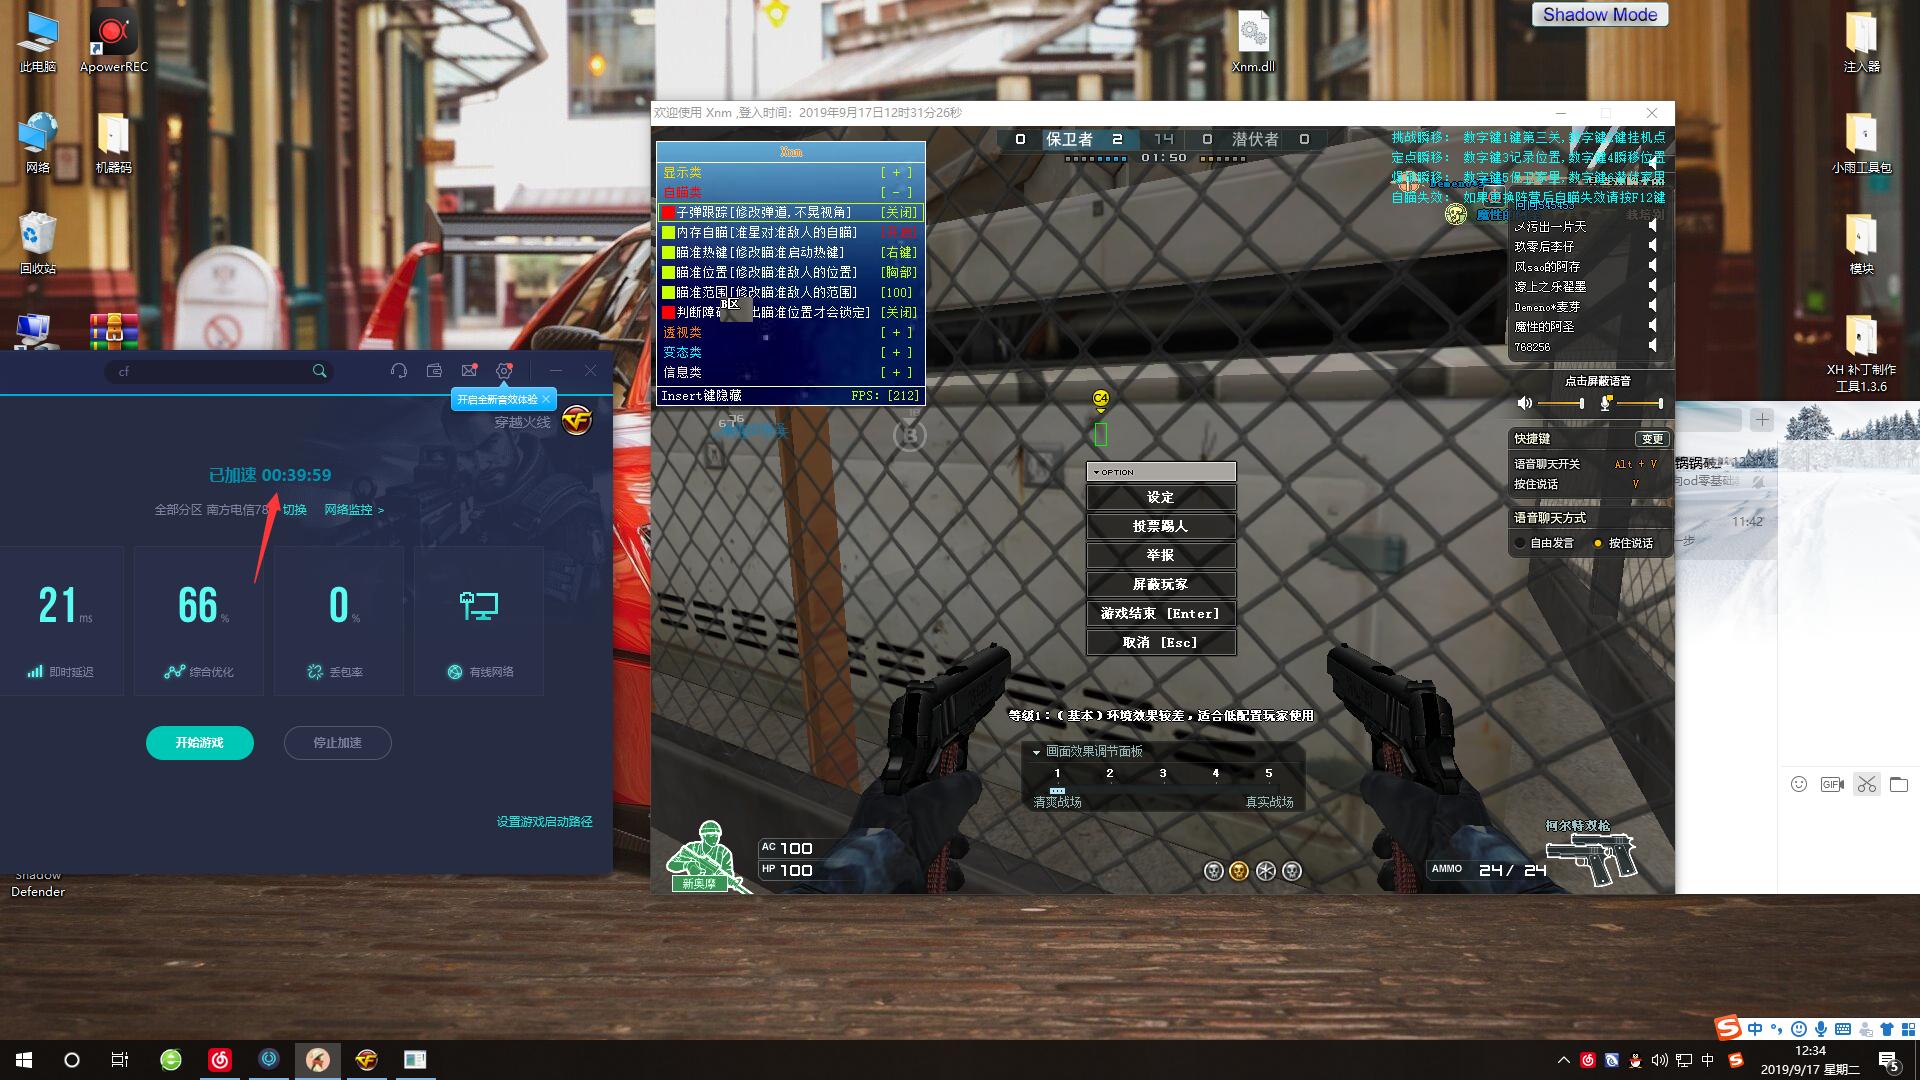 CF小糯米Xnm破解子弹跟踪内存自瞄多功能辅助